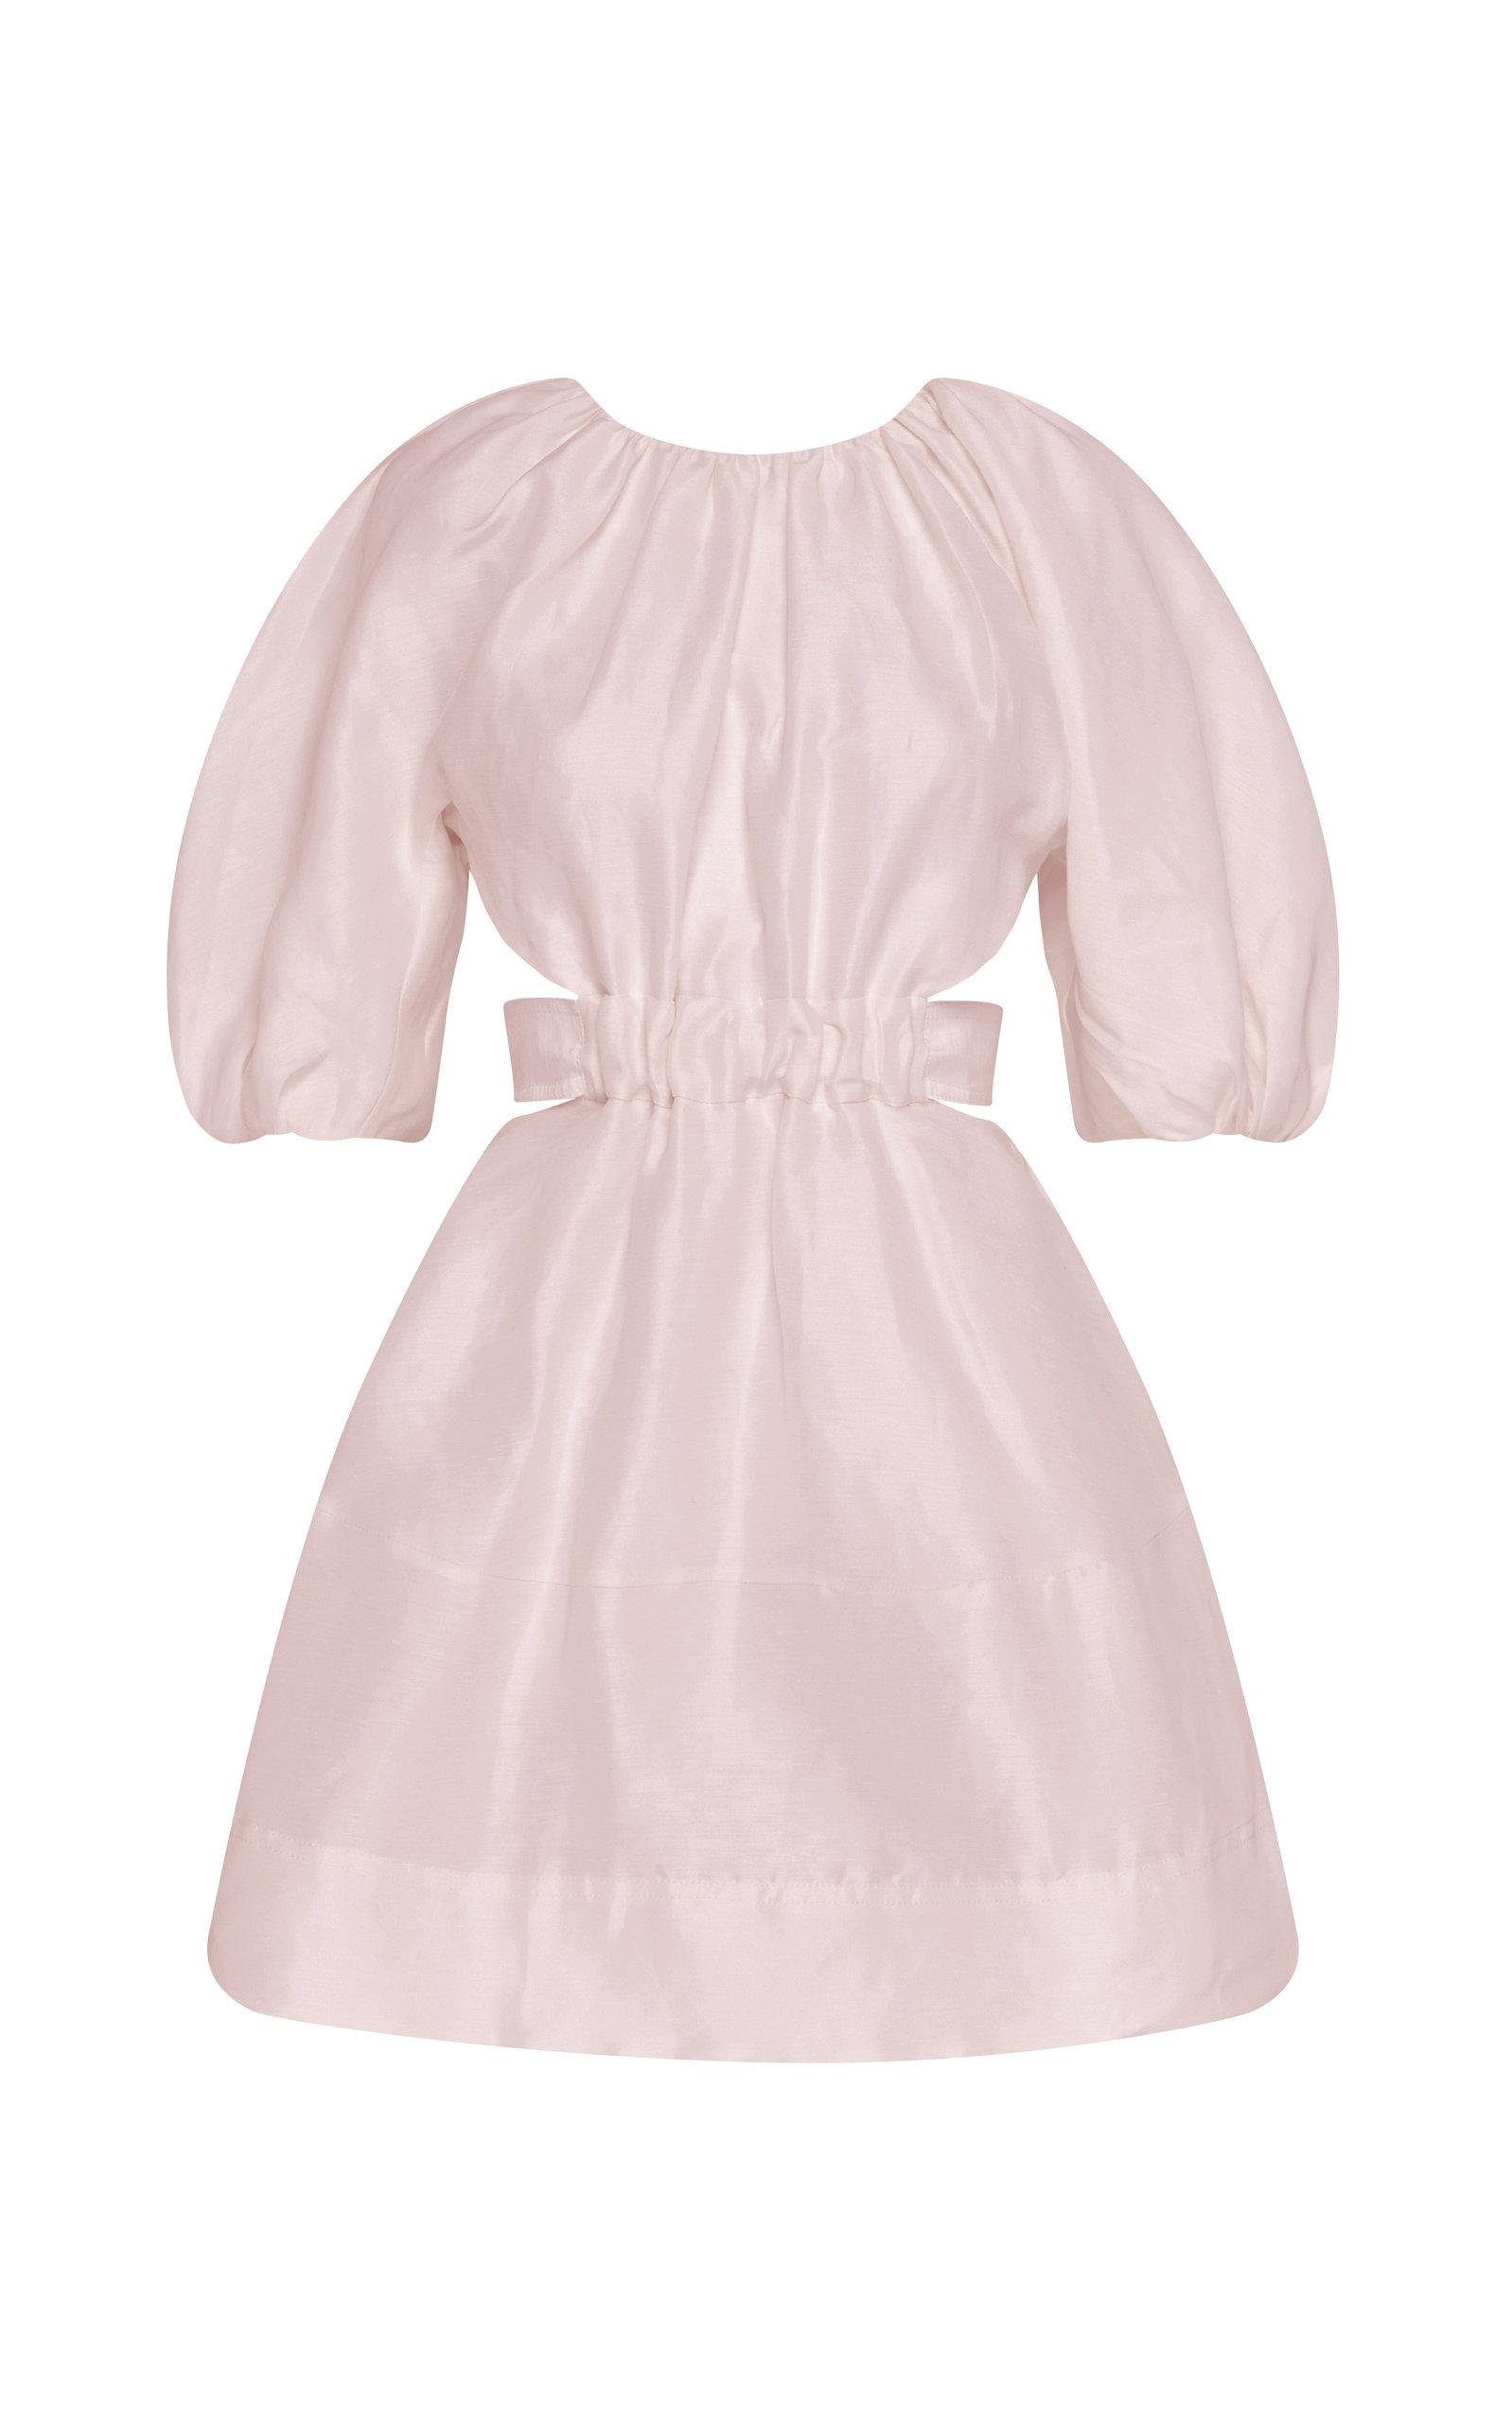 - Women's Psychedelia Cutout Linen-Blend Mini Dress